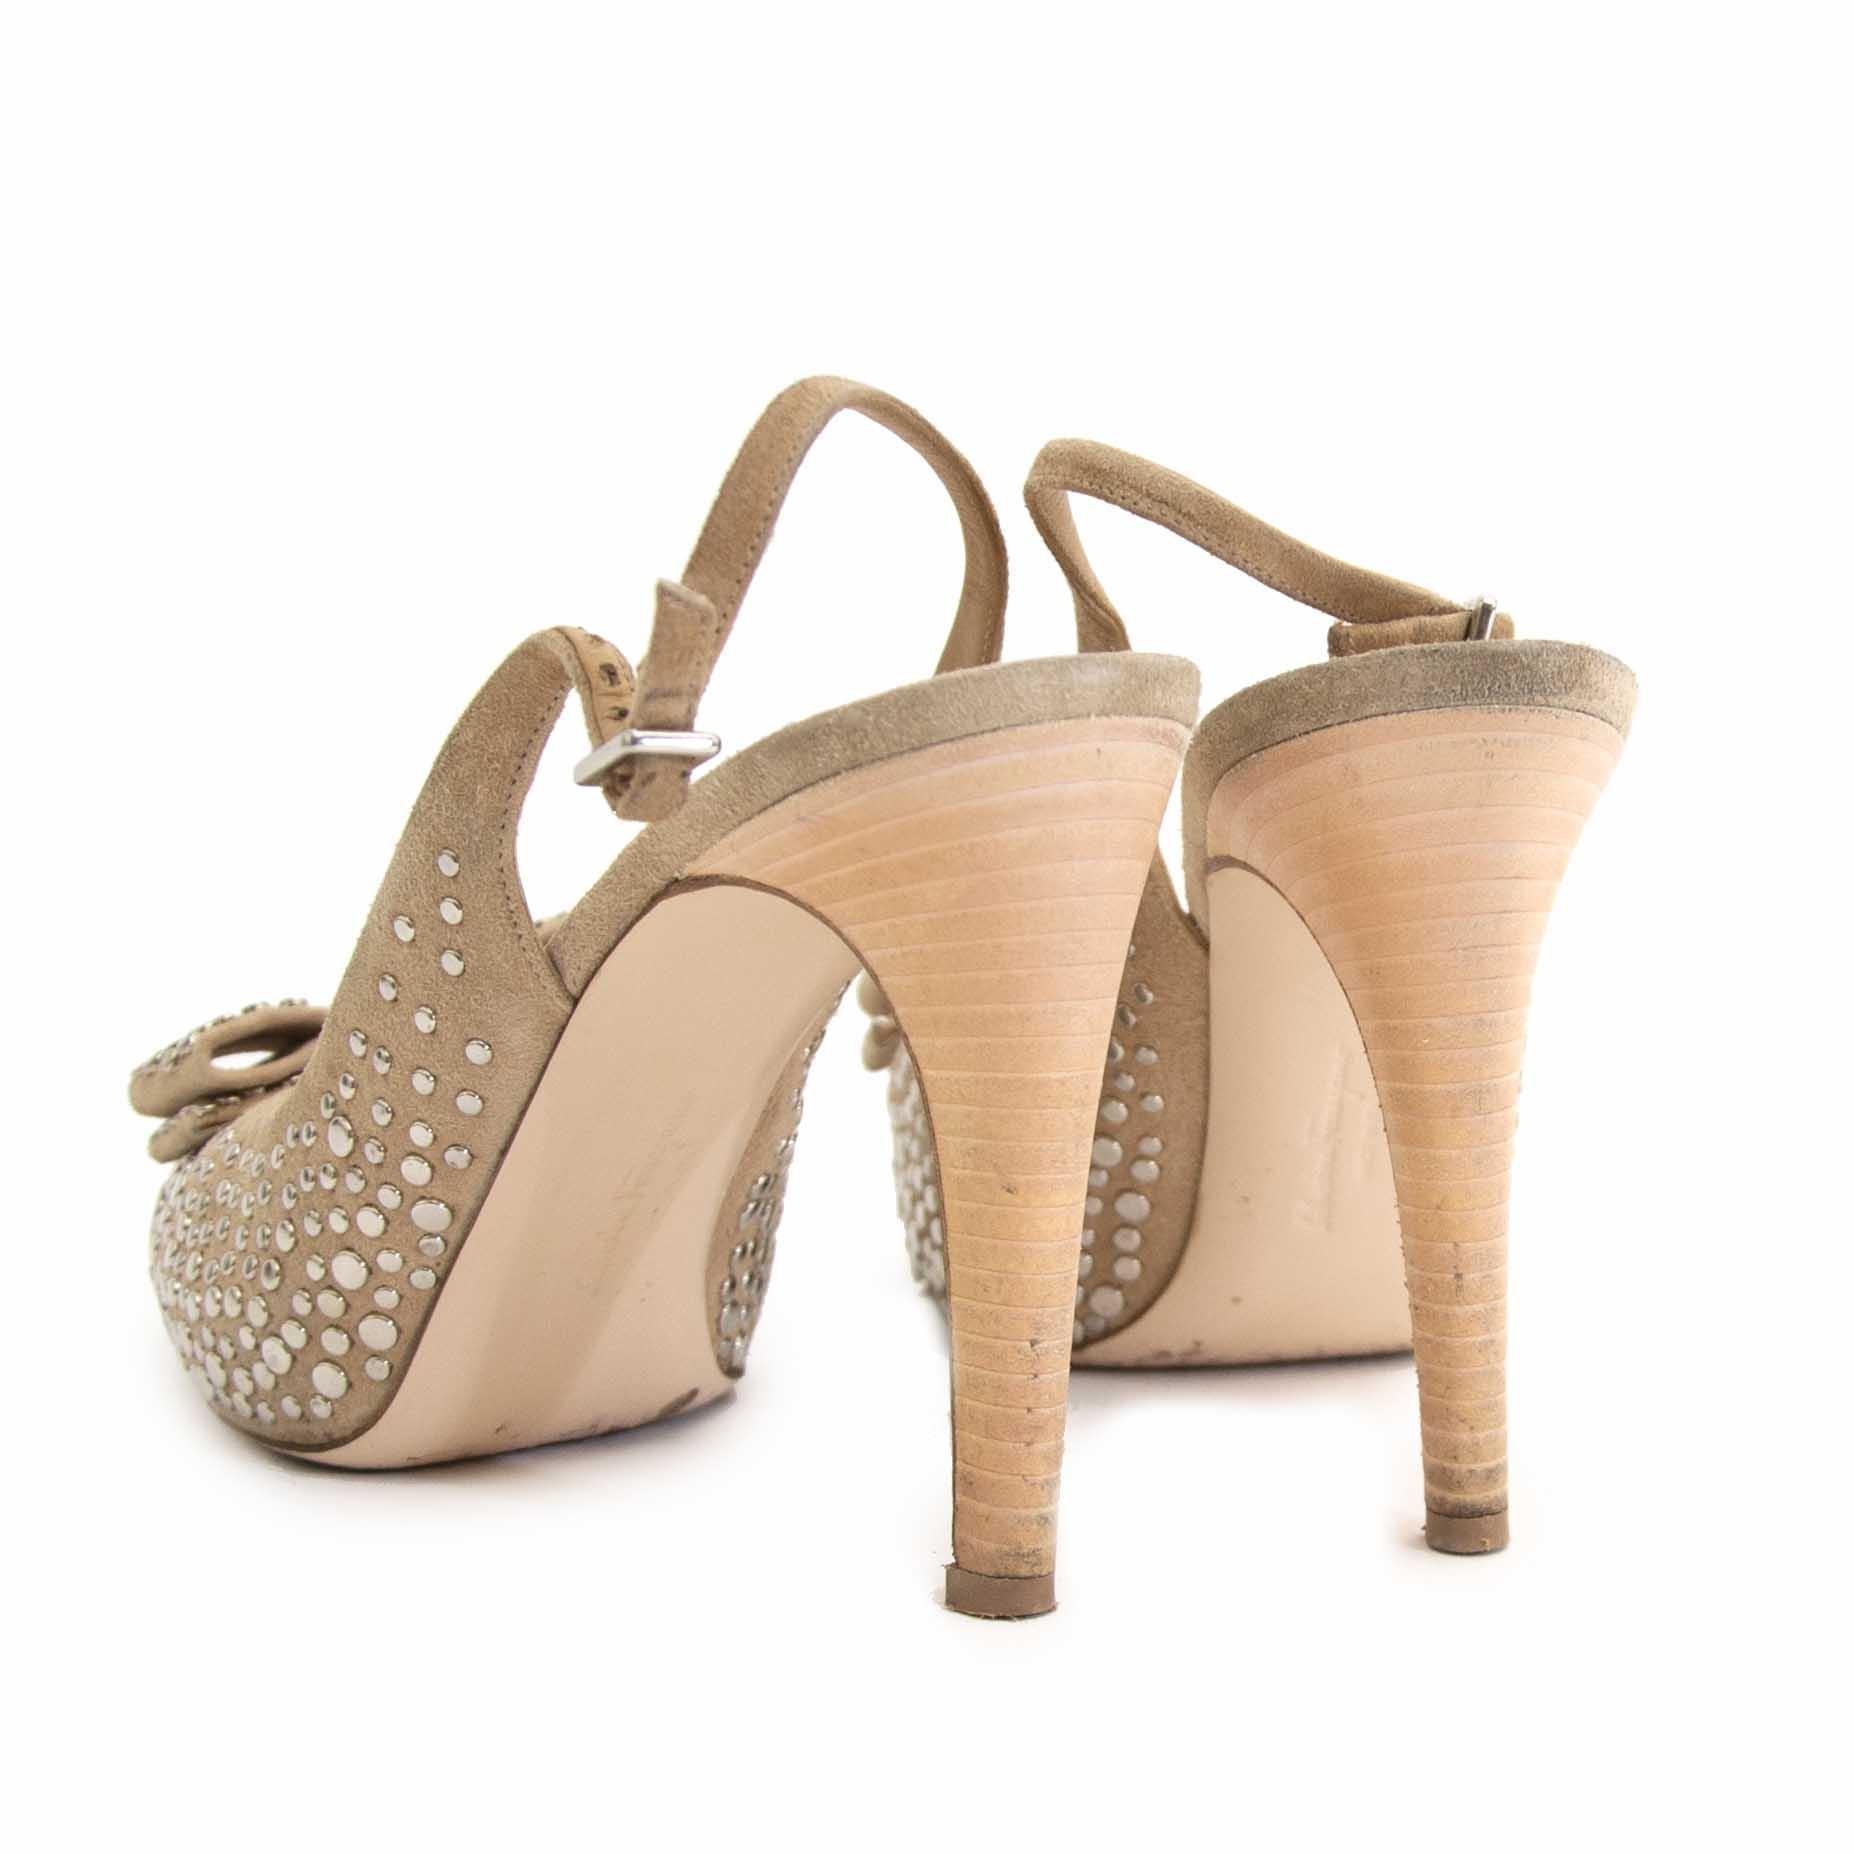 4da3b60fa91df Buy authentic second hand Ferragamo Studded Heels Bow online webshop  LabelLOV Achète seconde main Ferragamo Studded Heels Bow en ligne webshop  LabelLOV